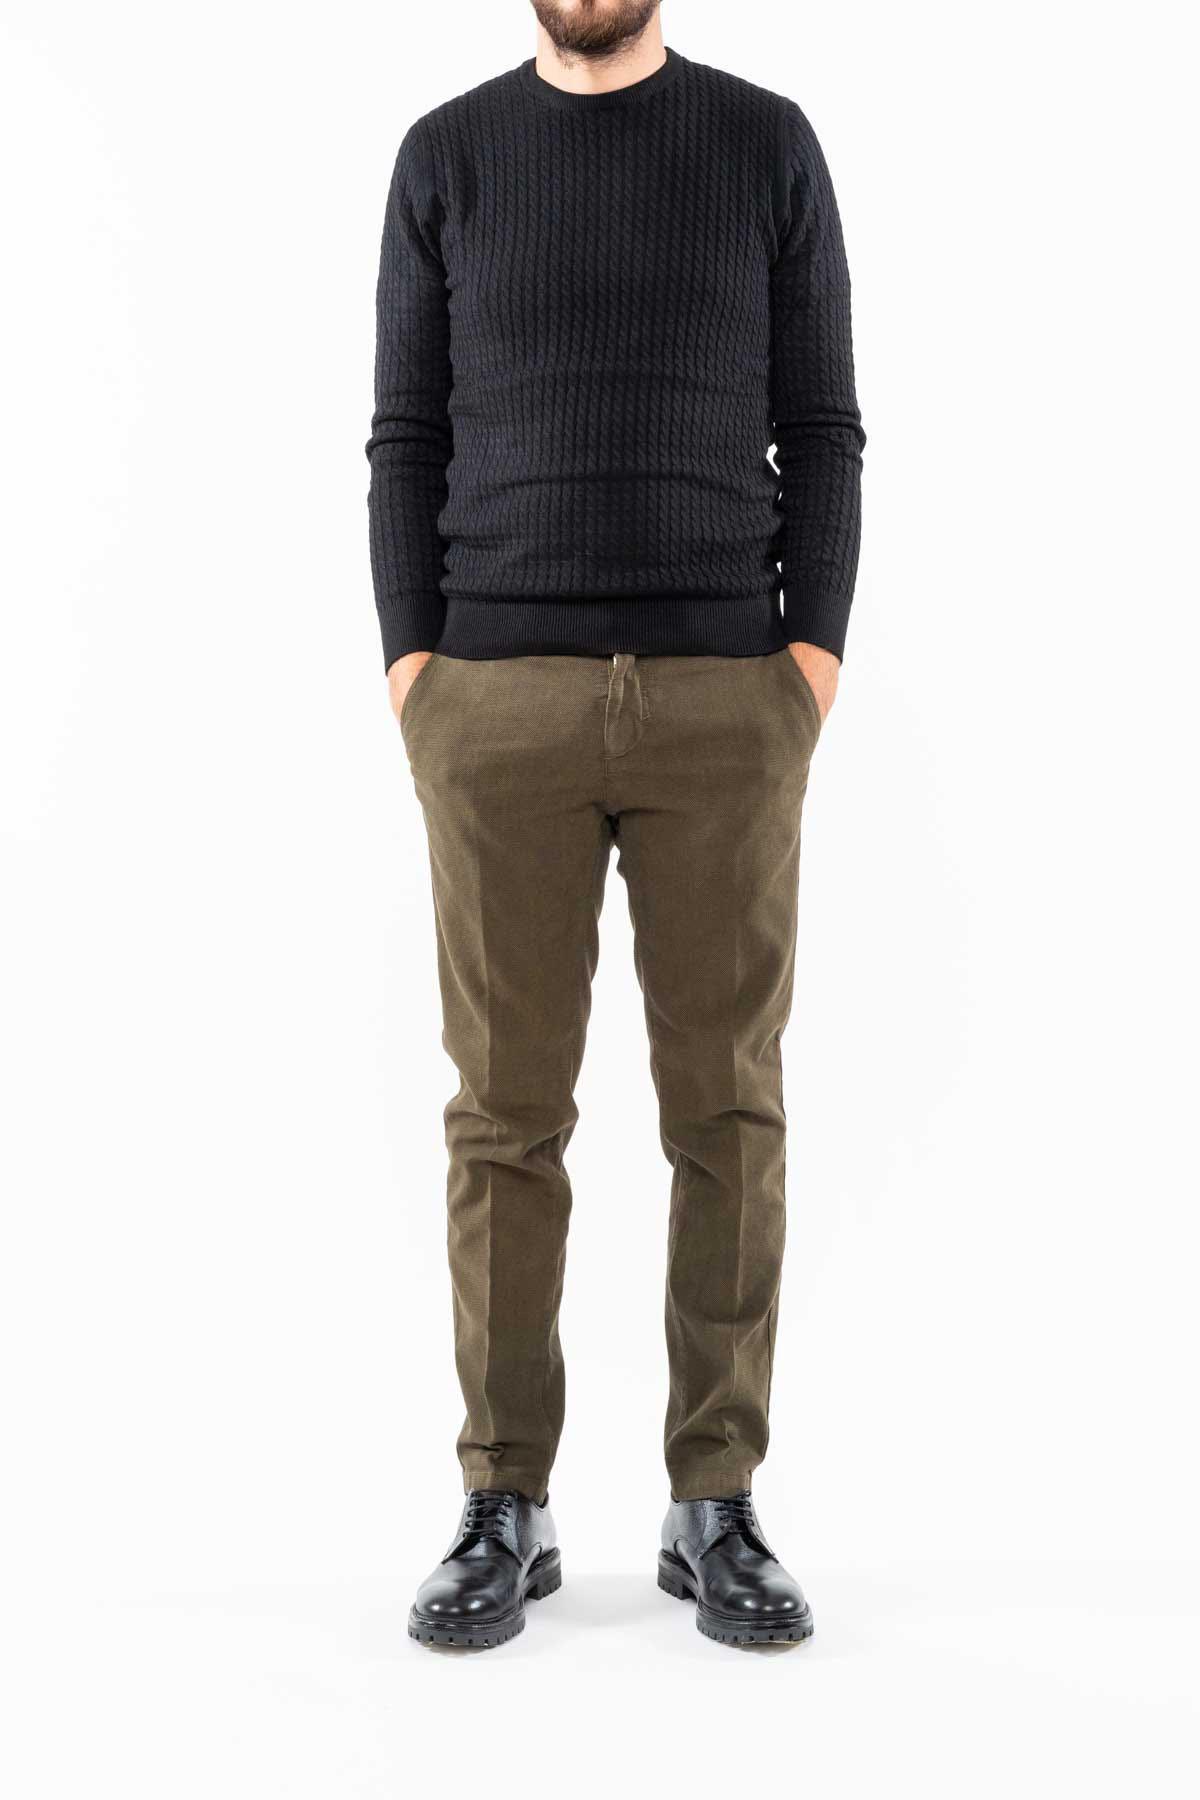 pantalone,militare